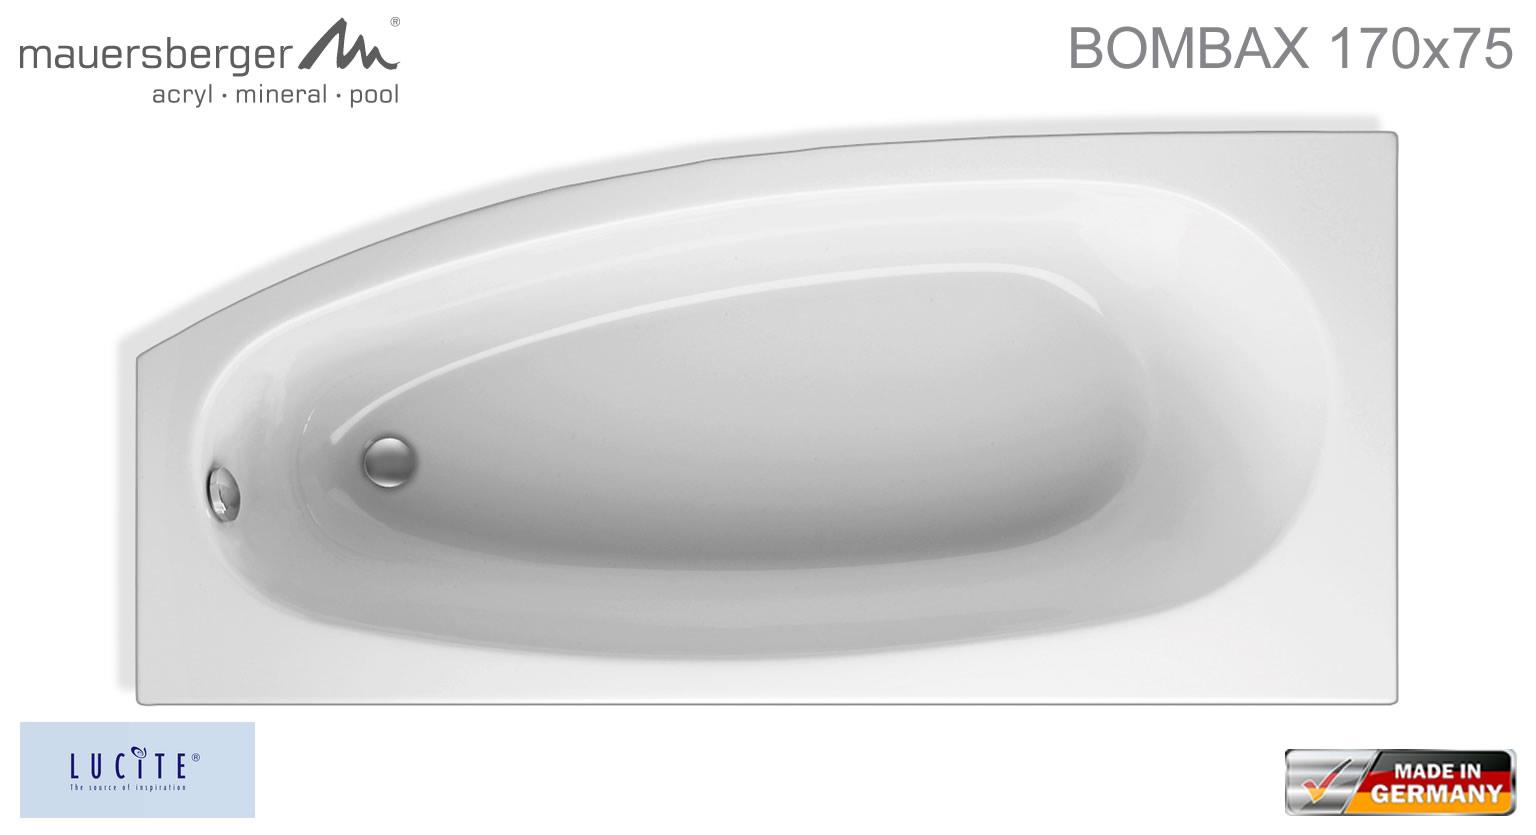 Mauersberger badewanne bombax 170 x 75 cm acryl for Asymmetrische badewanne 170